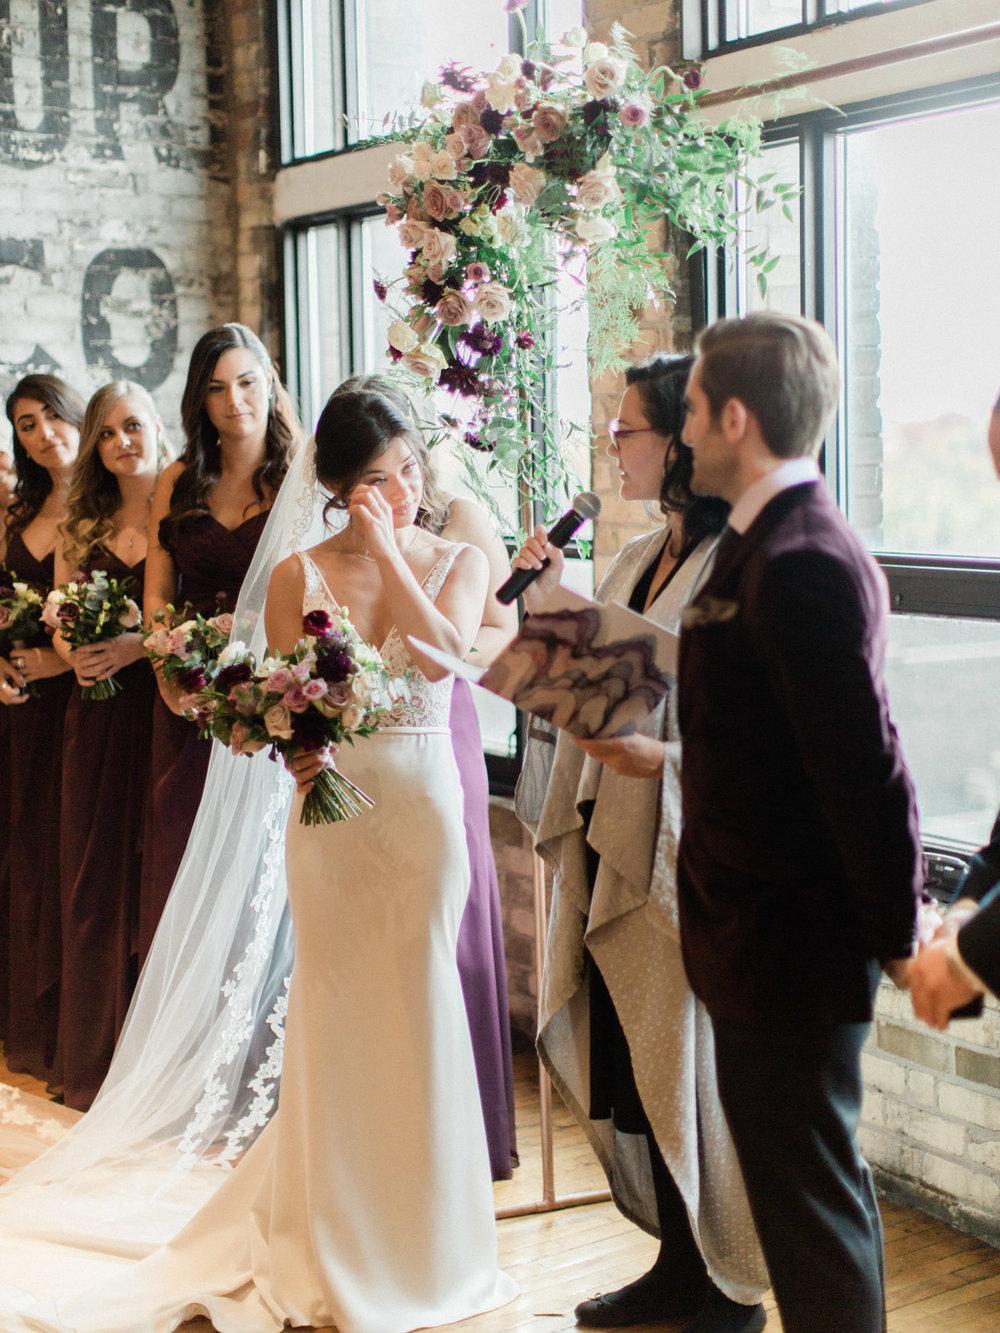 Toronto-wedding-photographer-intimate-italian-the-burroughes-downtown87.jpg